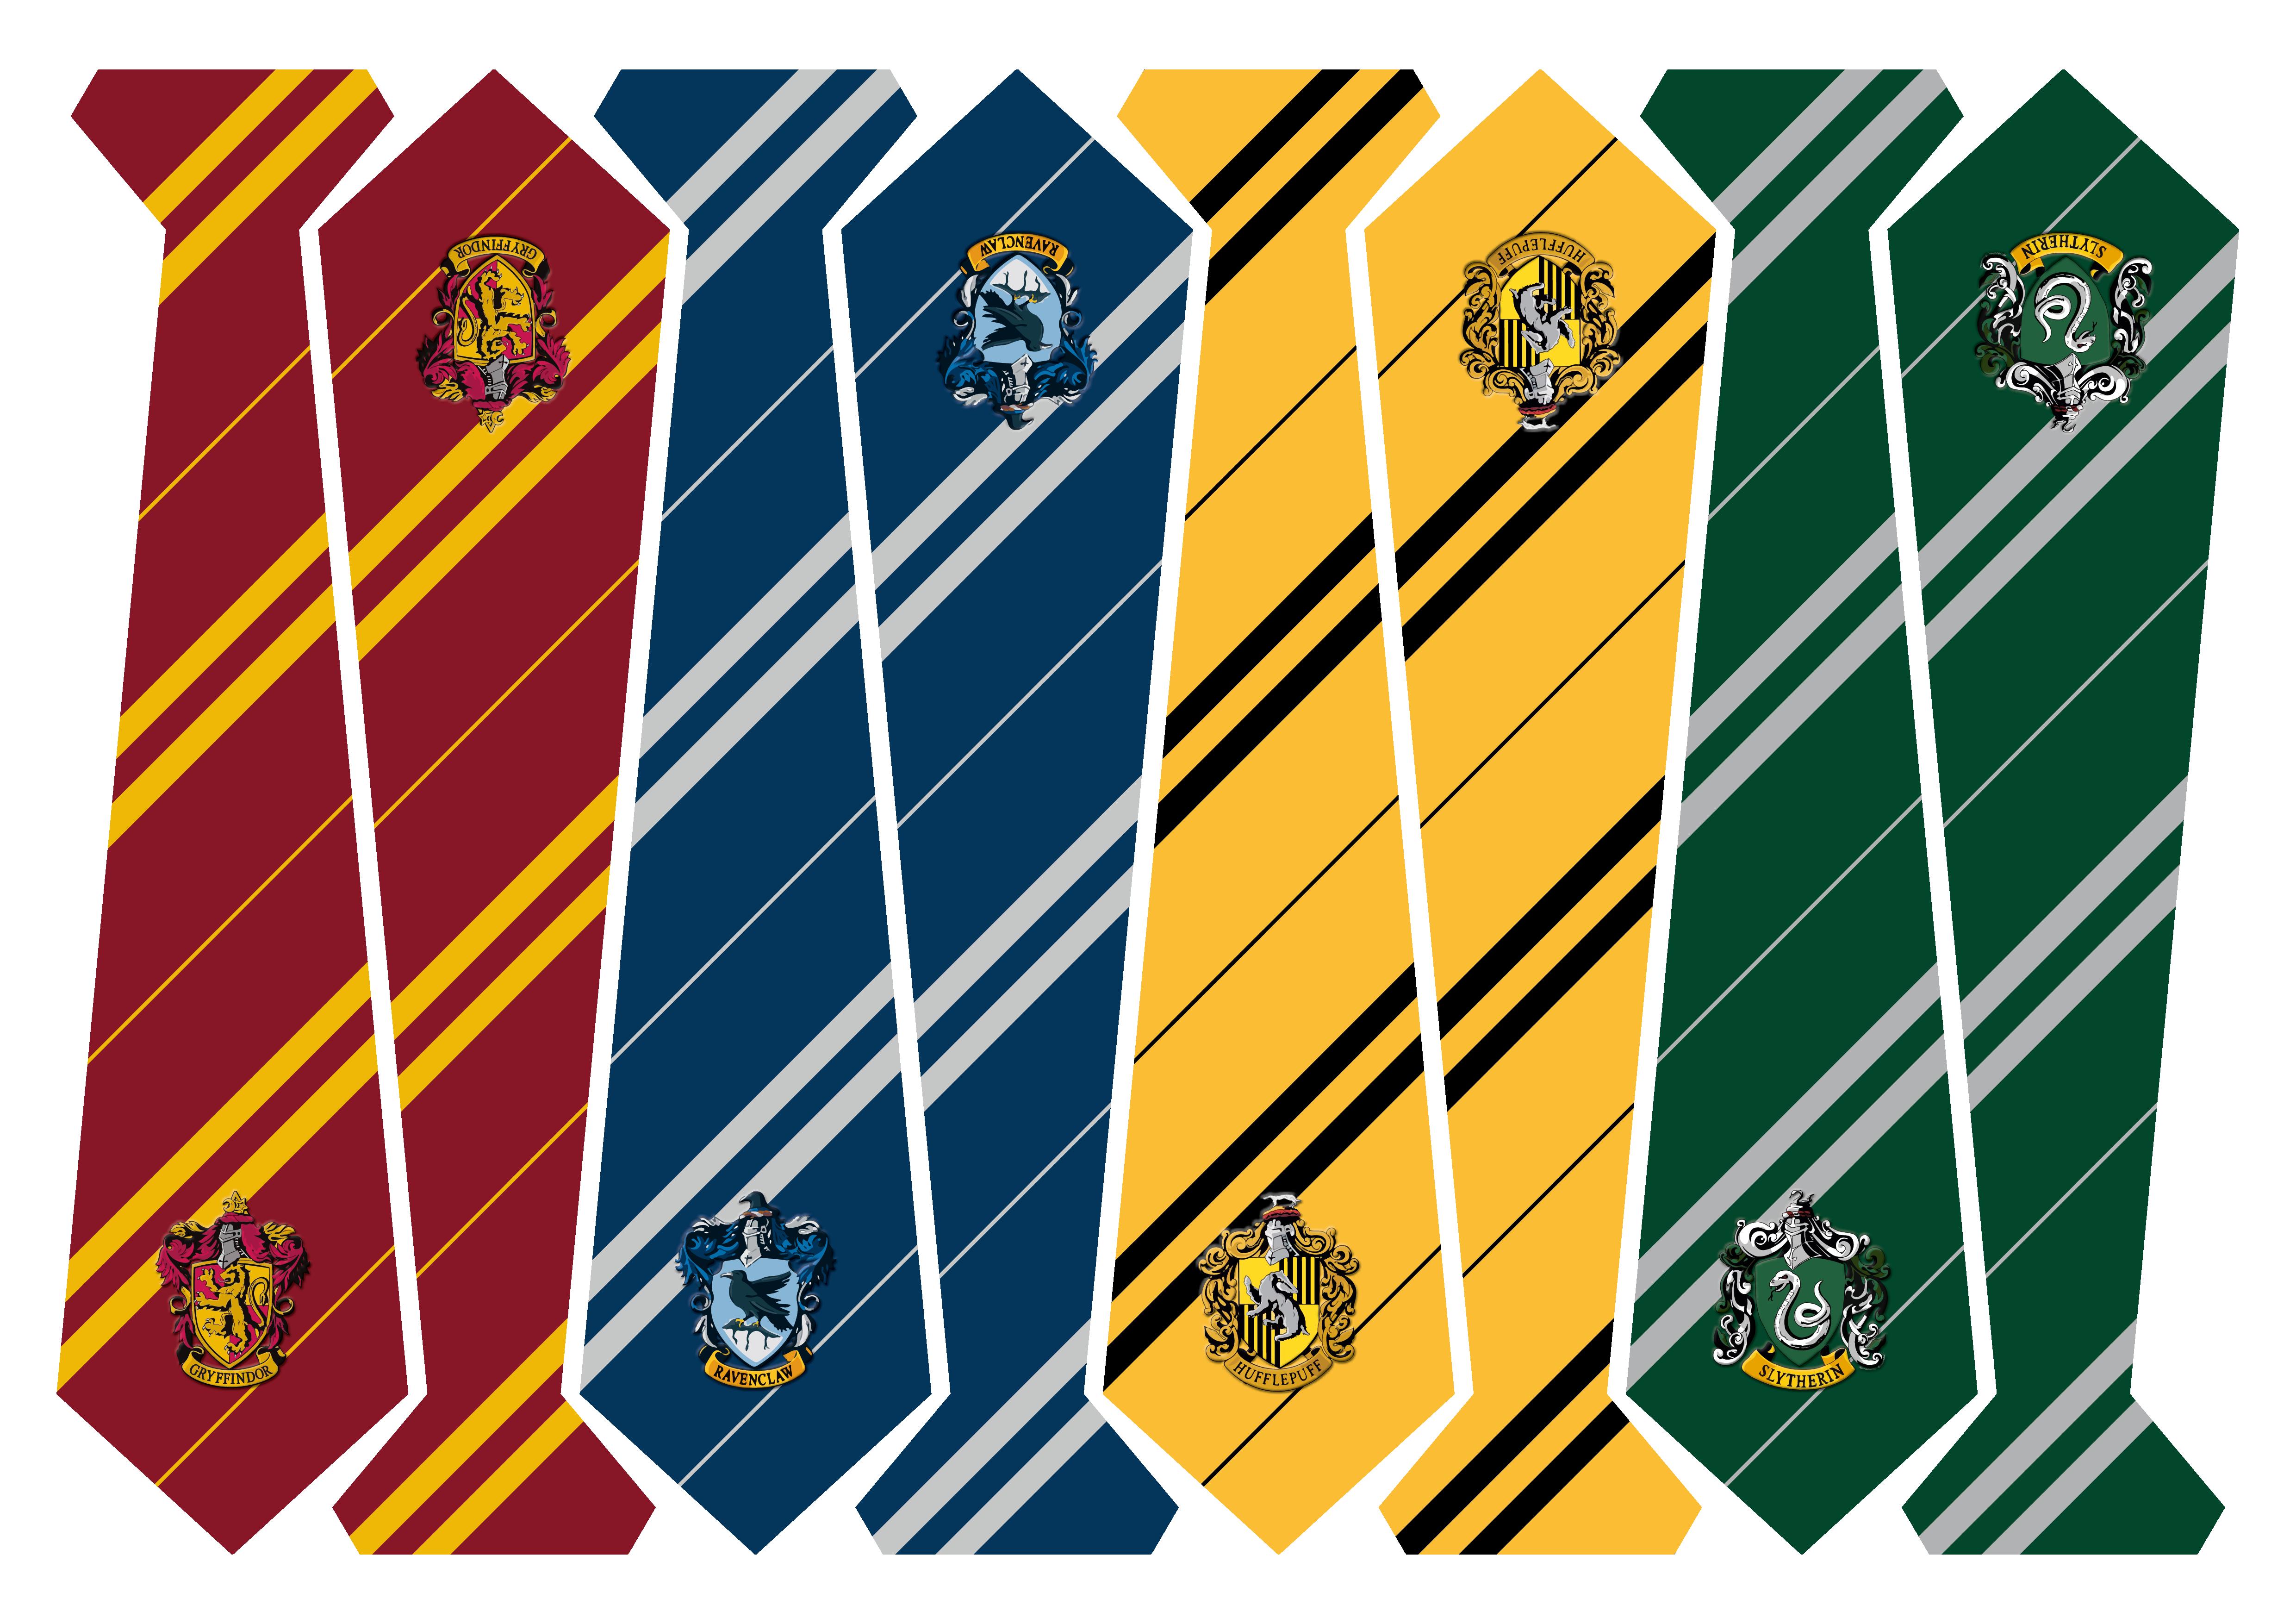 Harry Potter Krawatten Um Ausdrucken Auf A3 Harry Potter Ornamente Harry Potter Buchstaben Harry Potter Krawatte